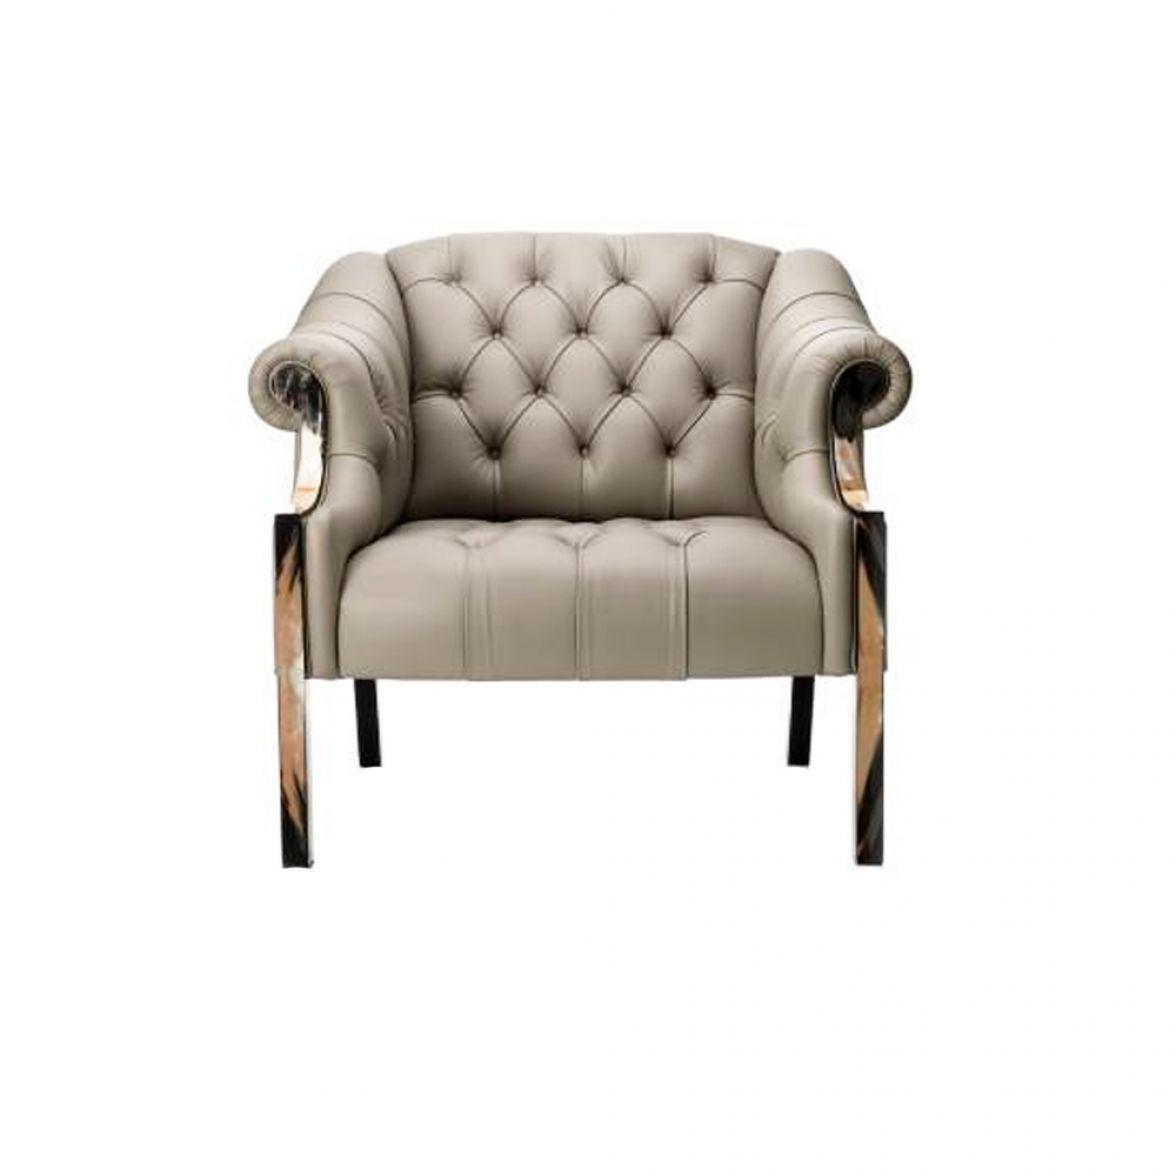 Sofia armchair фото цена